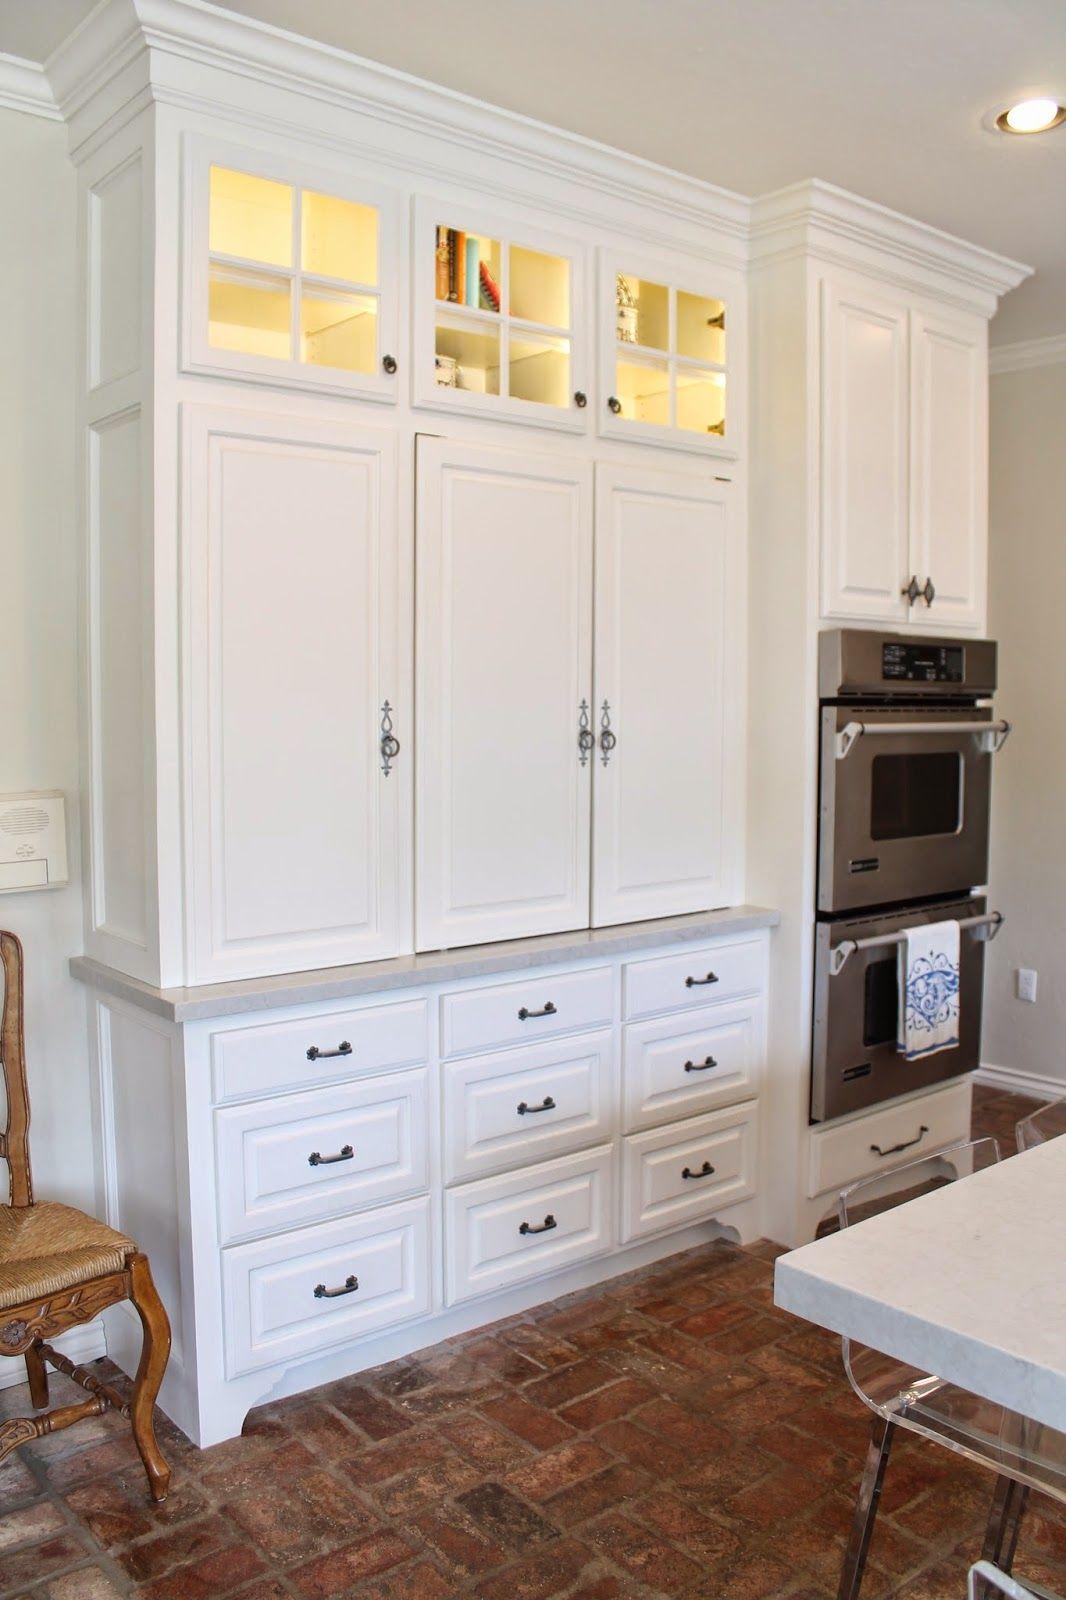 Eleven Gables Hidden Appliance Cabinet And Desk Command Center In The Kitchen Hide Appliances Kitchen Remodel Appliance Cabinet